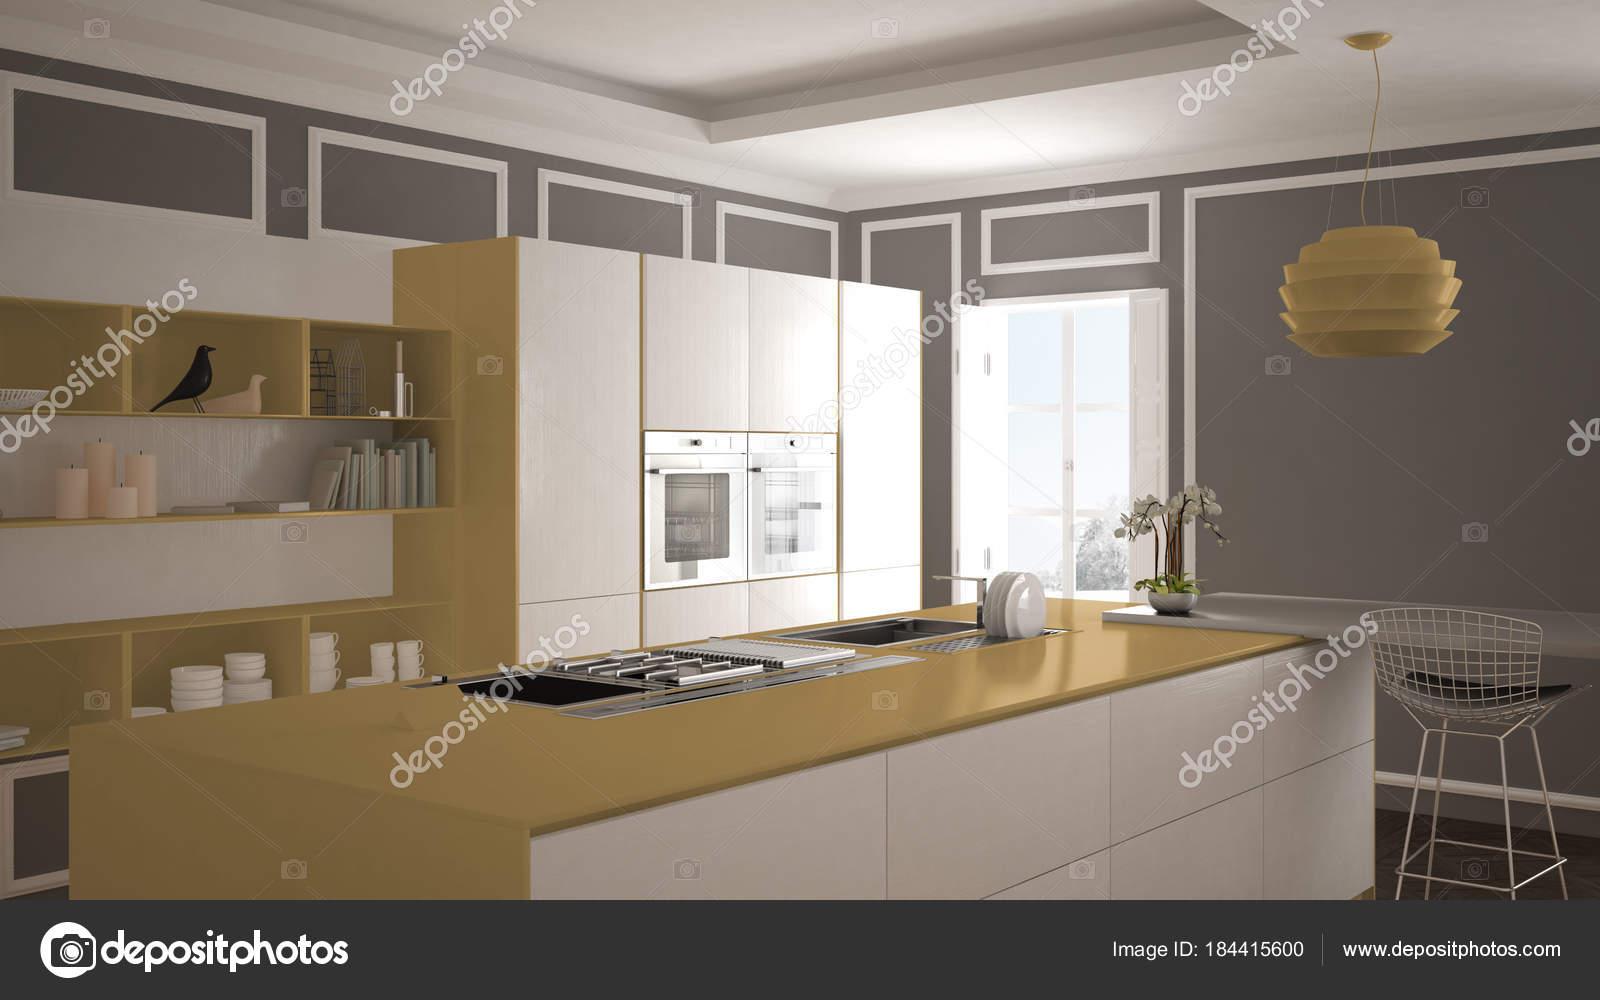 https://st3.depositphotos.com/1152281/18441/i/1600/depositphotos_184415600-stockafbeelding-moderne-keuken-in-het-klassieke.jpg